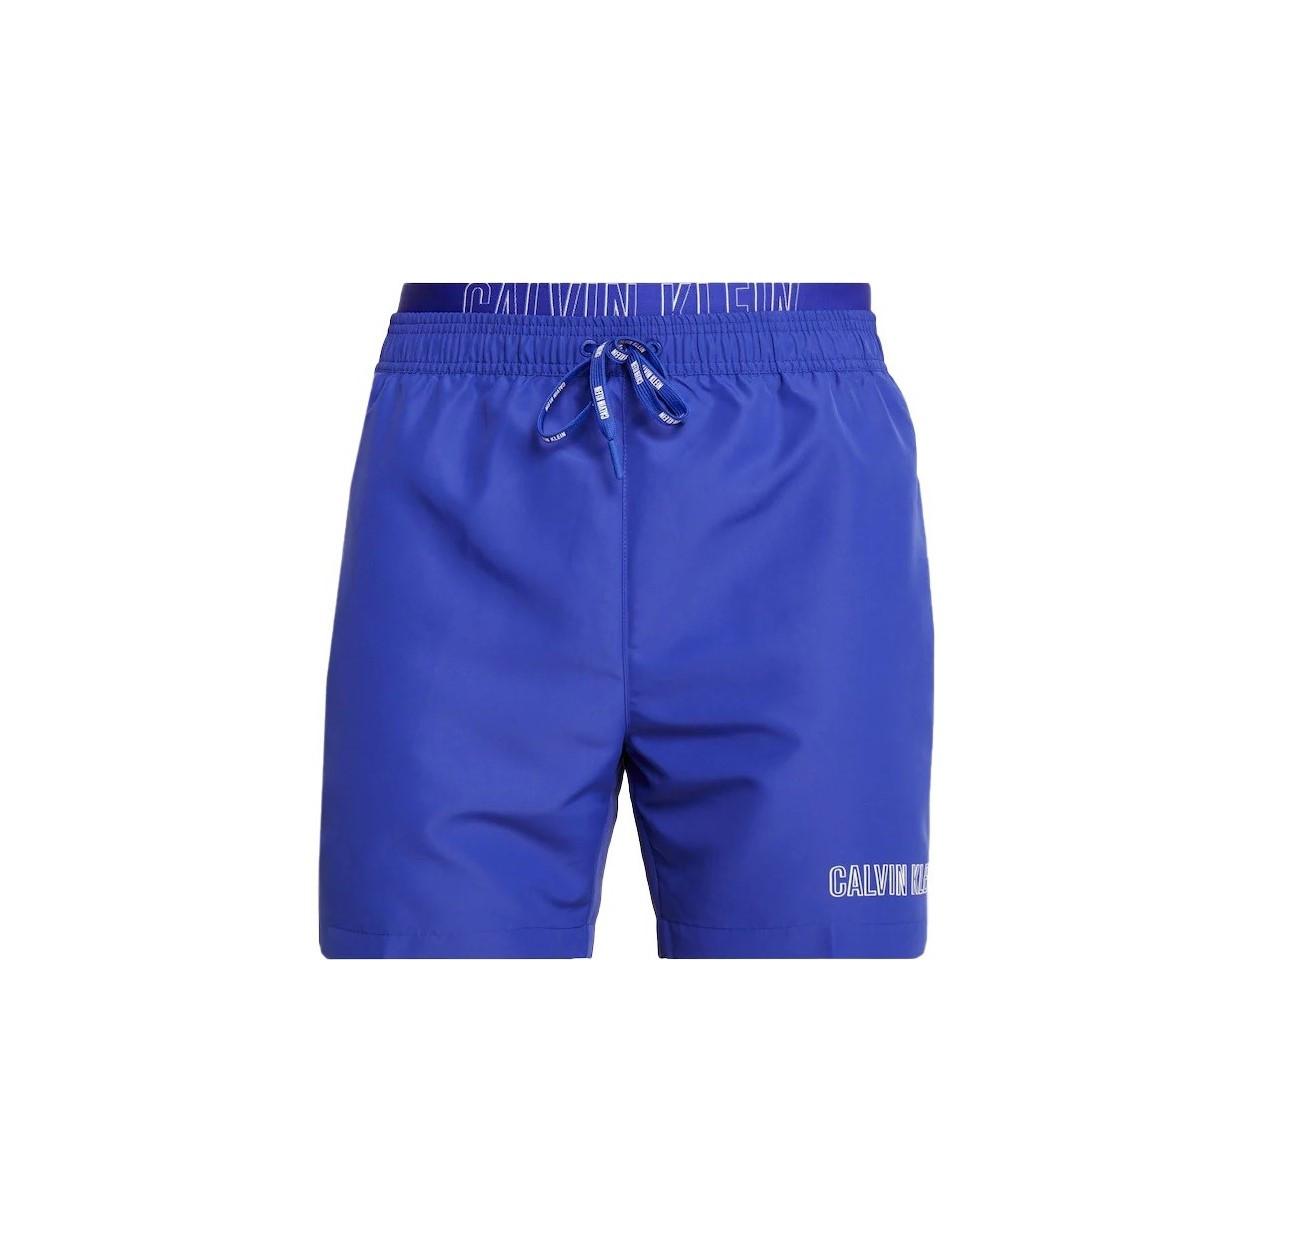 Calvin Klein Calvin Klein pánské modré plavky